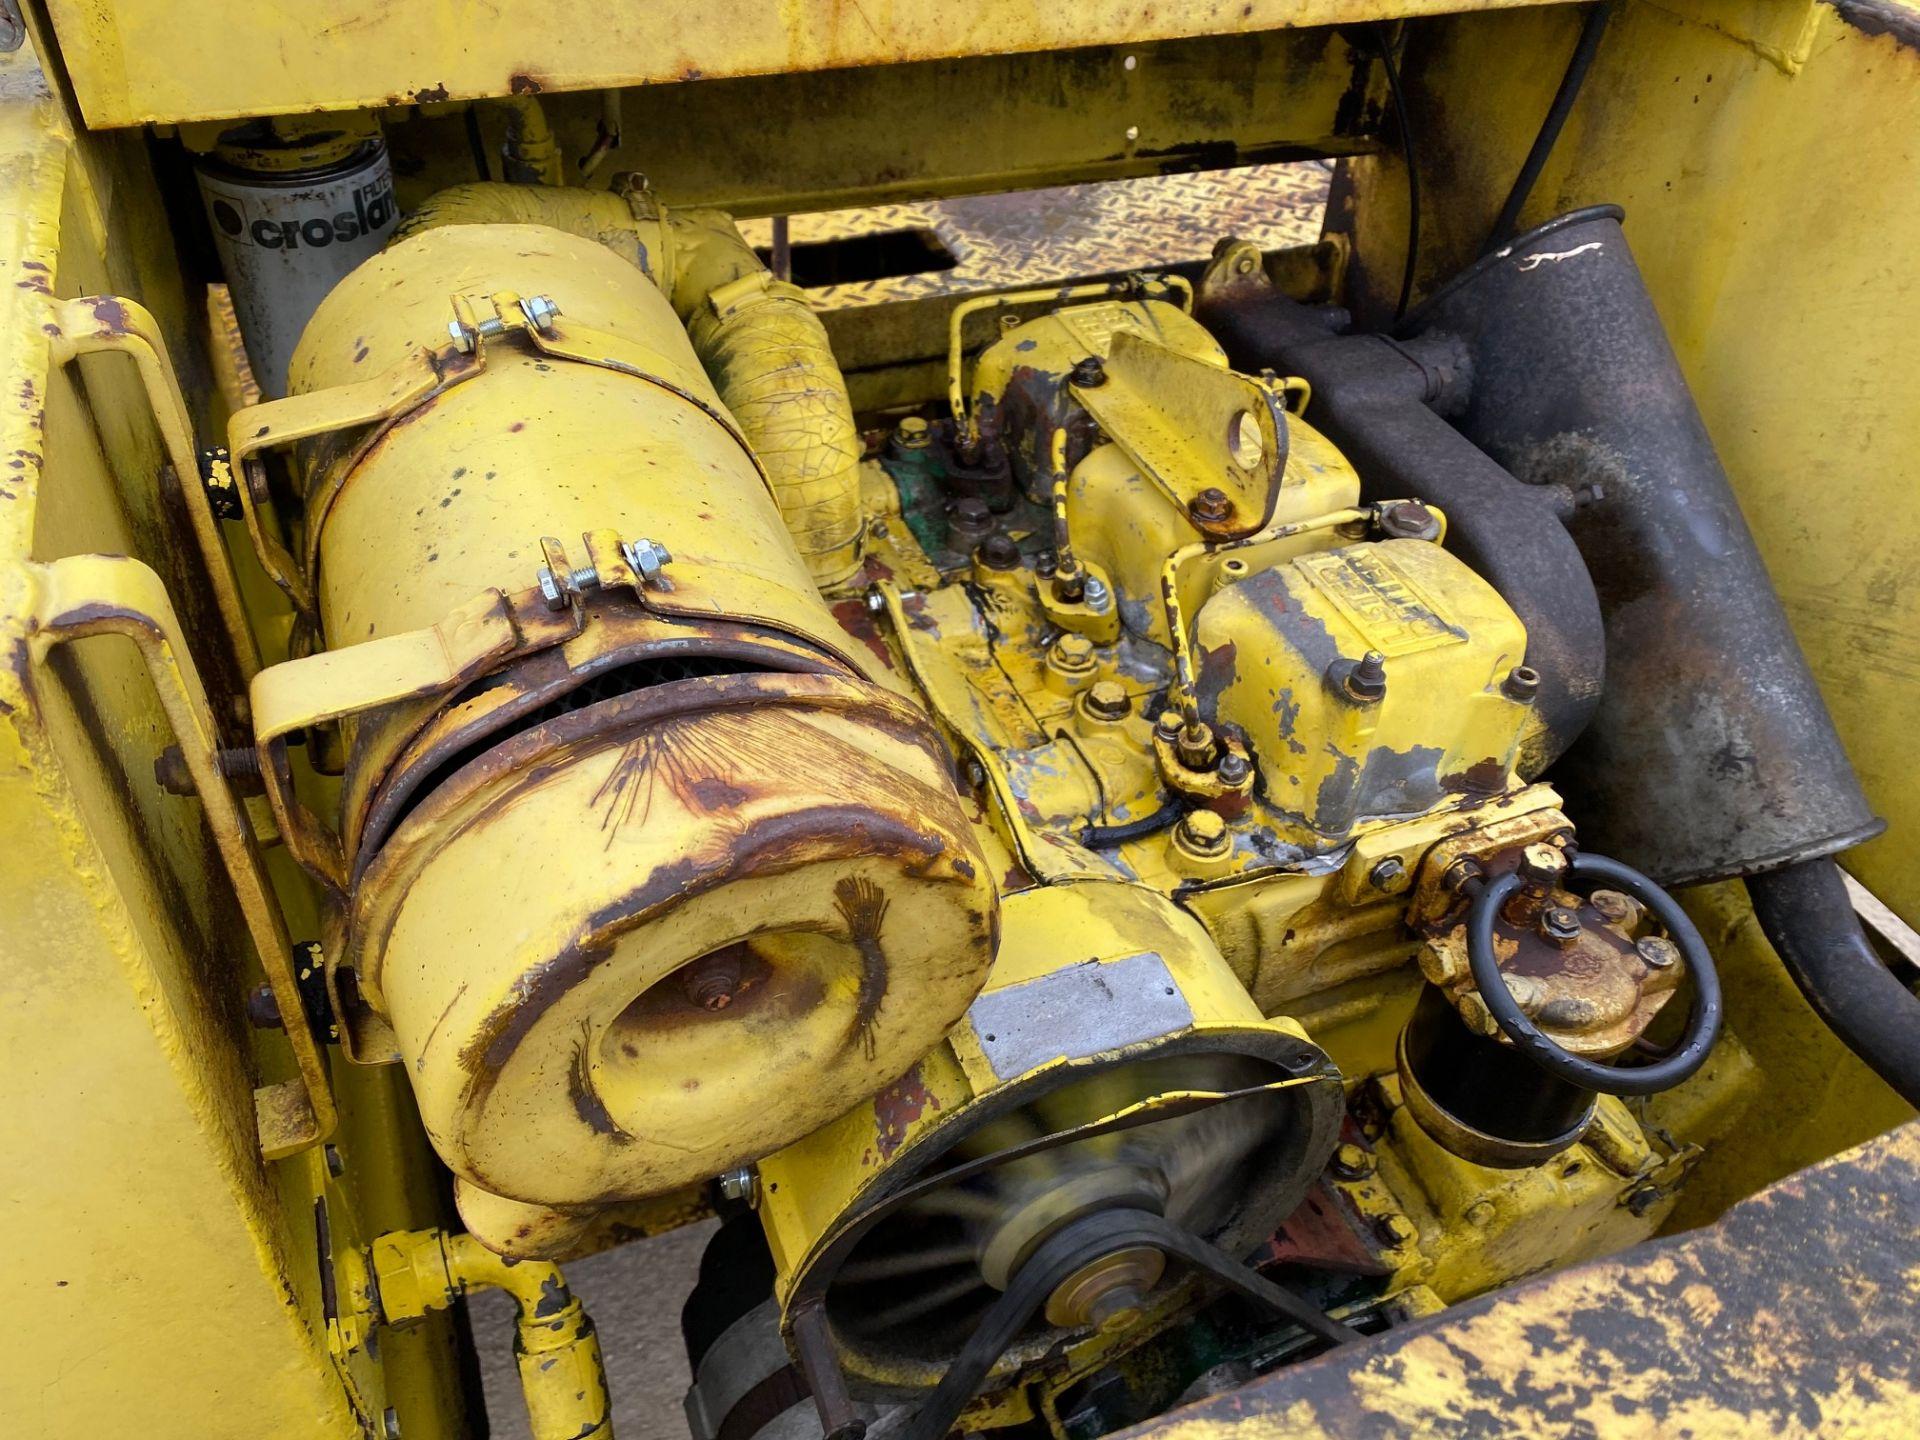 Thwaites 4 ton dumper, 4x4, electric start, Roll bar, 3 cylinder Lister Petter engine - Image 5 of 5